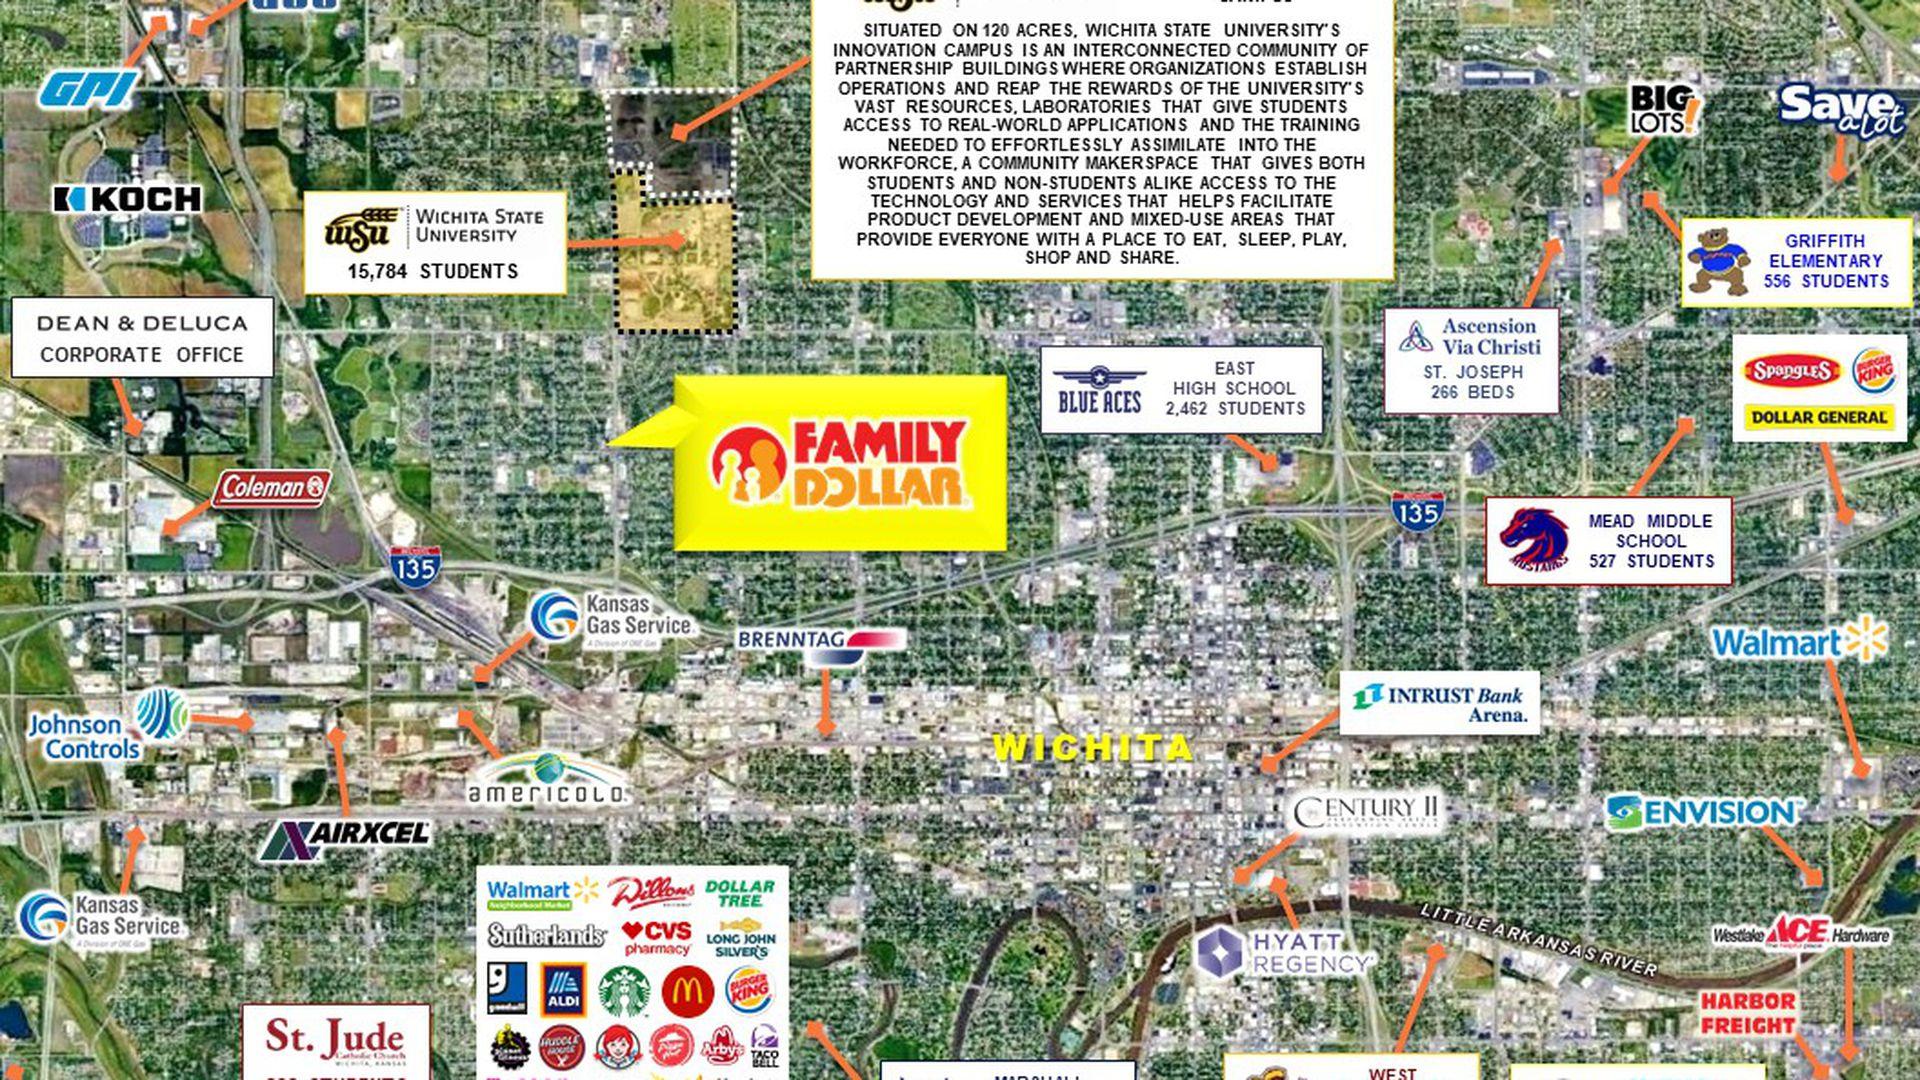 2408 East 21st Street North, Wichita, KS 67214 United States